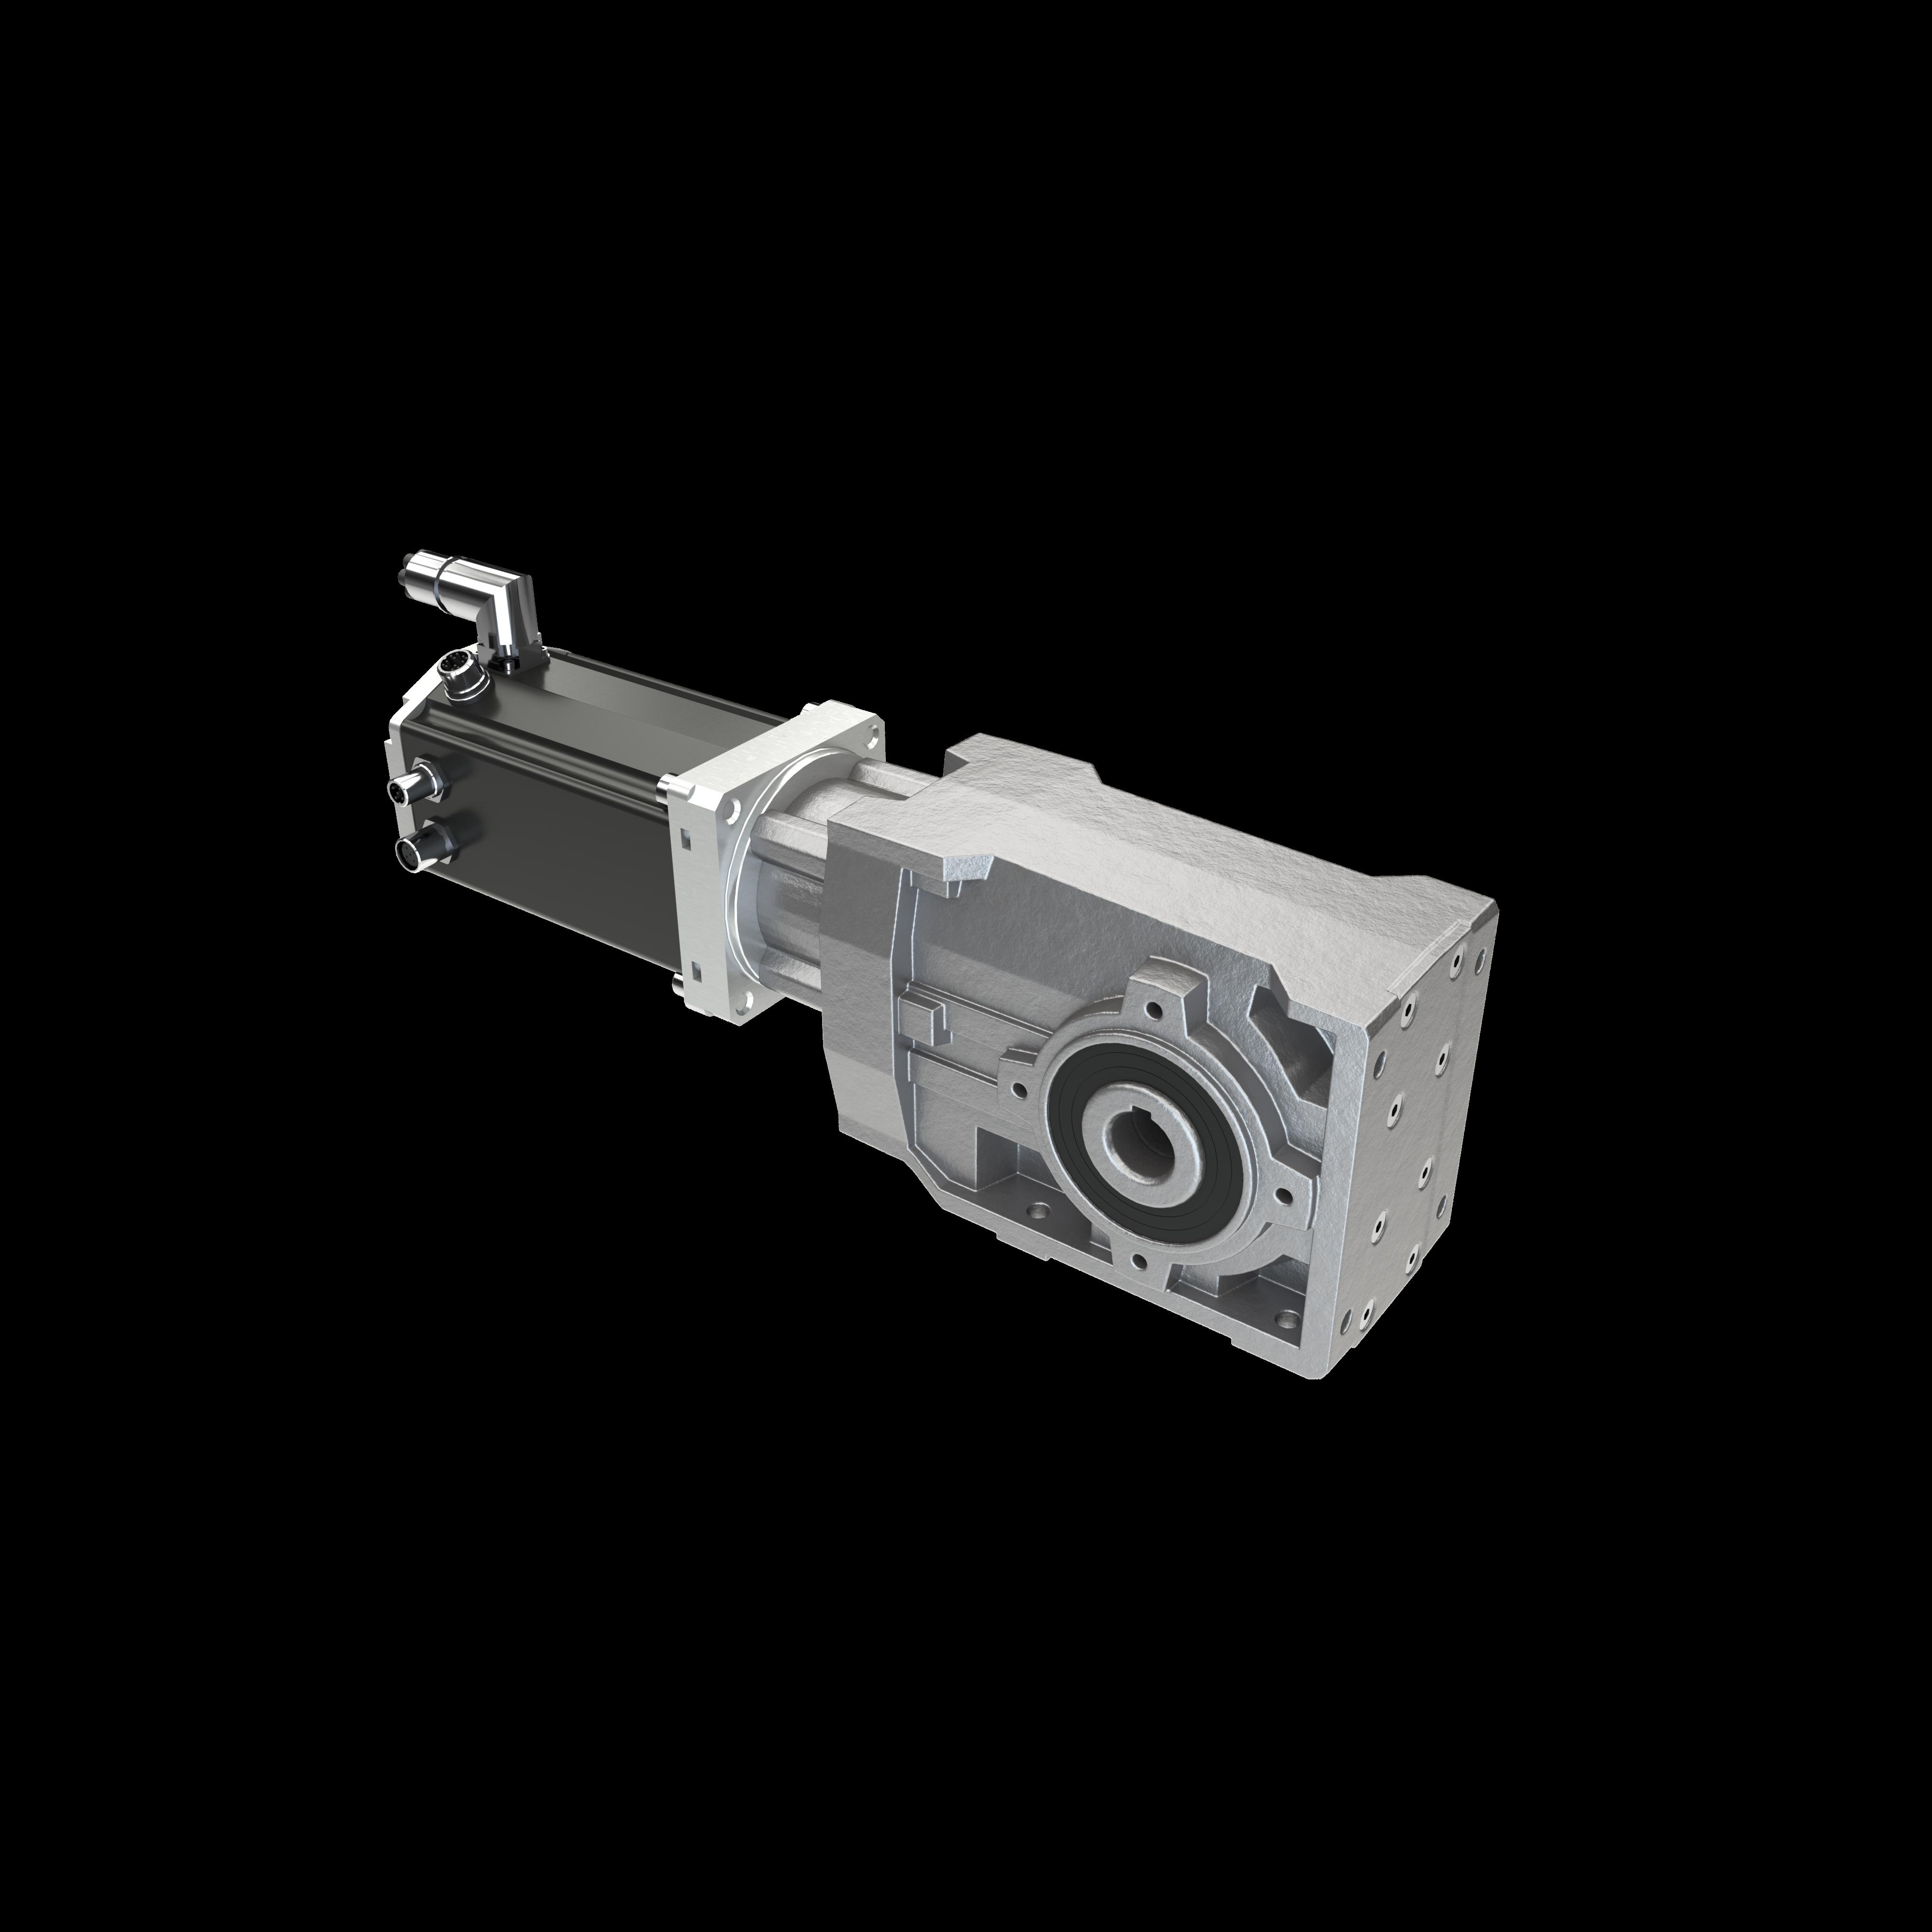 KG 150